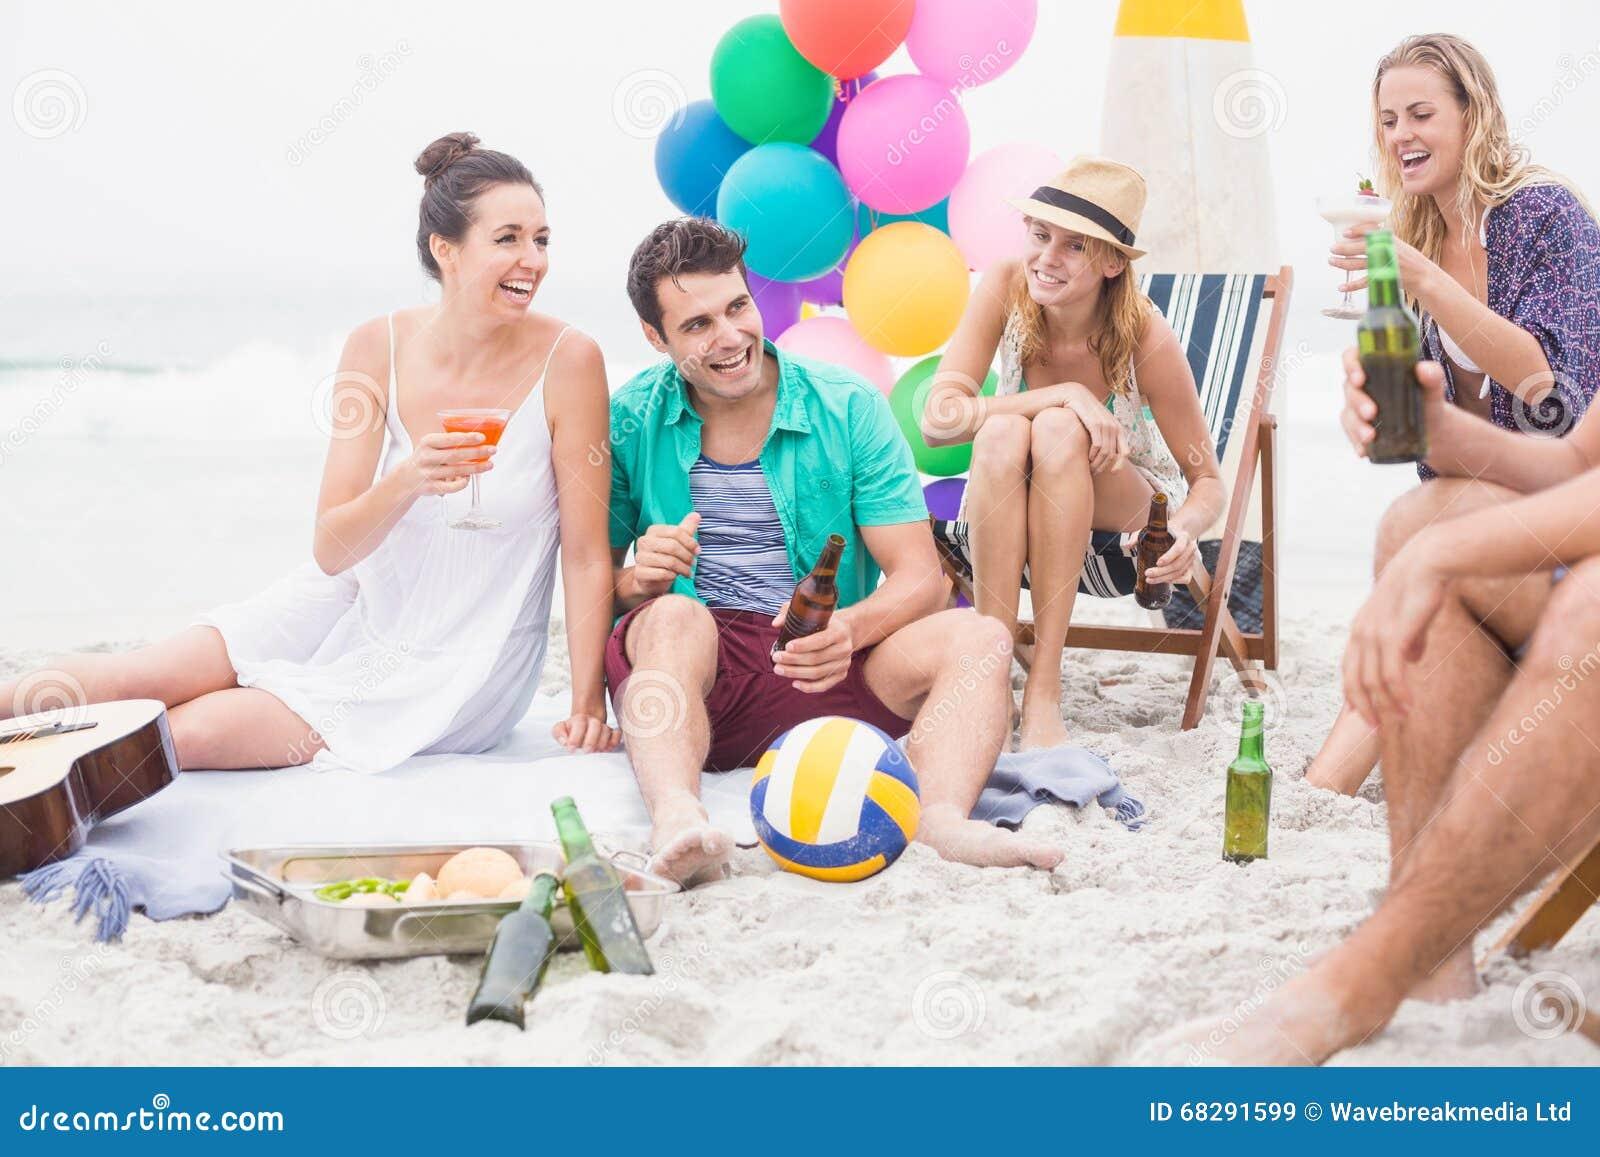 Friends having enjoyment